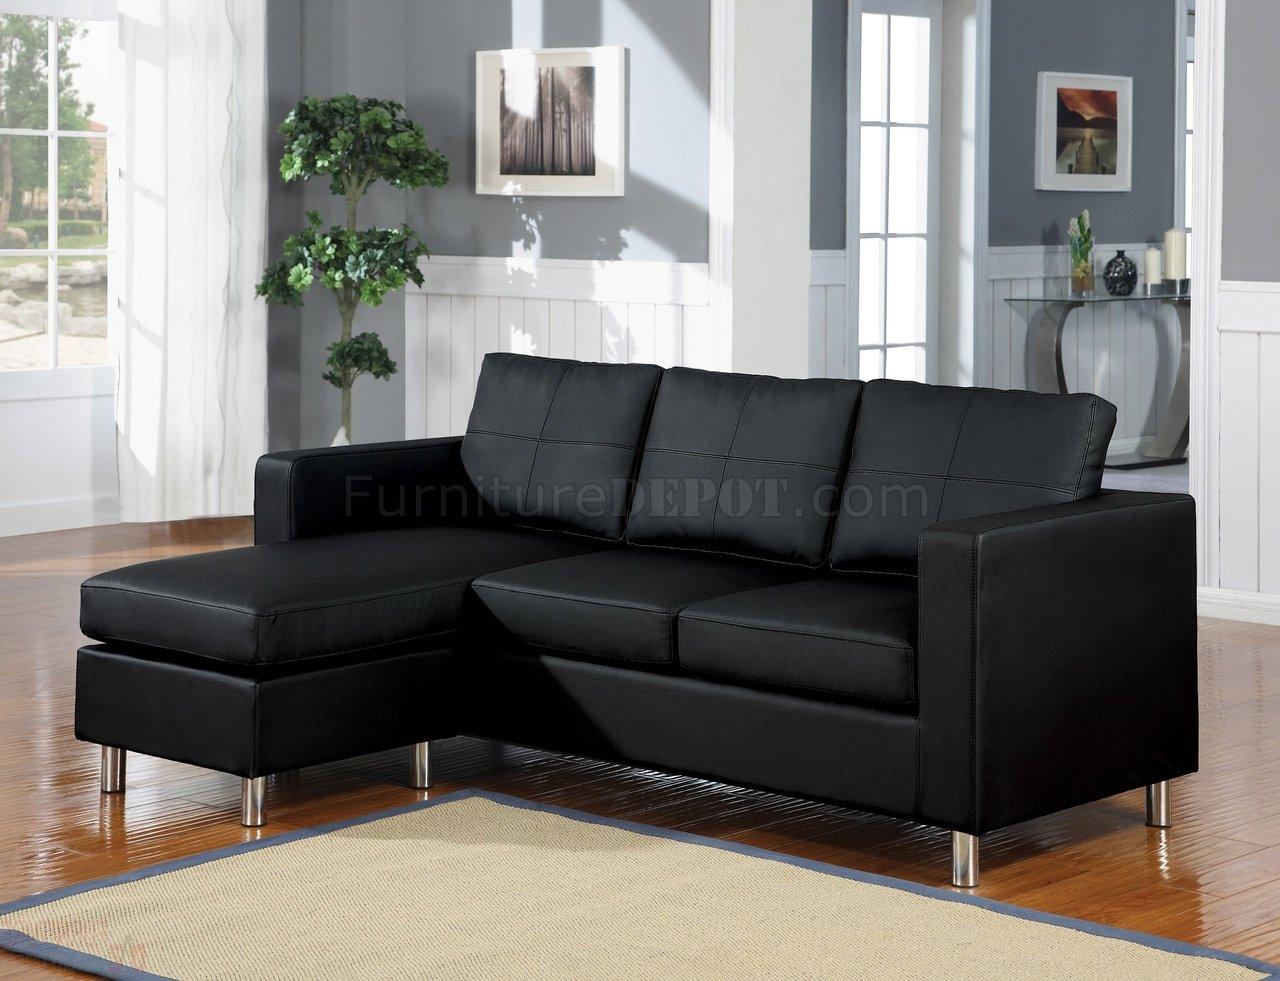 15065 Kemen Sectional Sofa In Black Vinyl By Acme